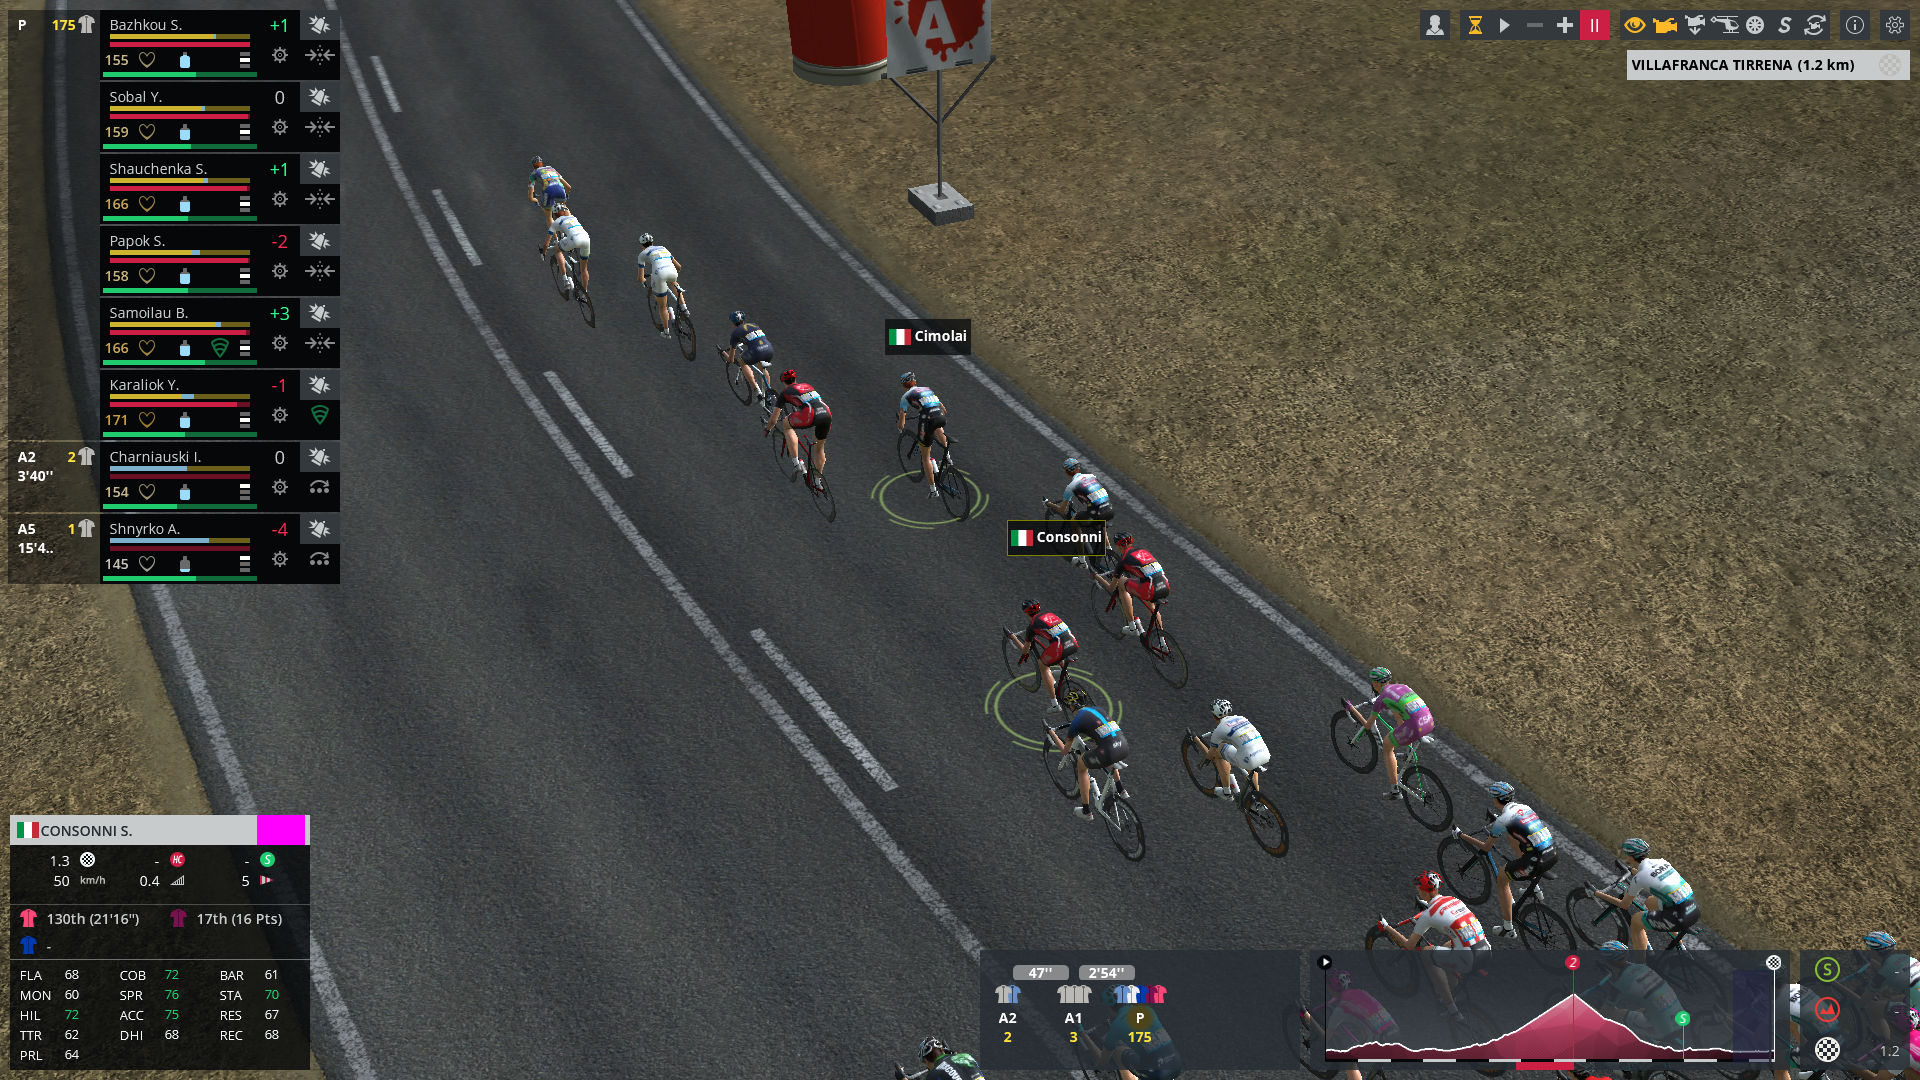 WK3 Giro Sim Ic0g2gop_o